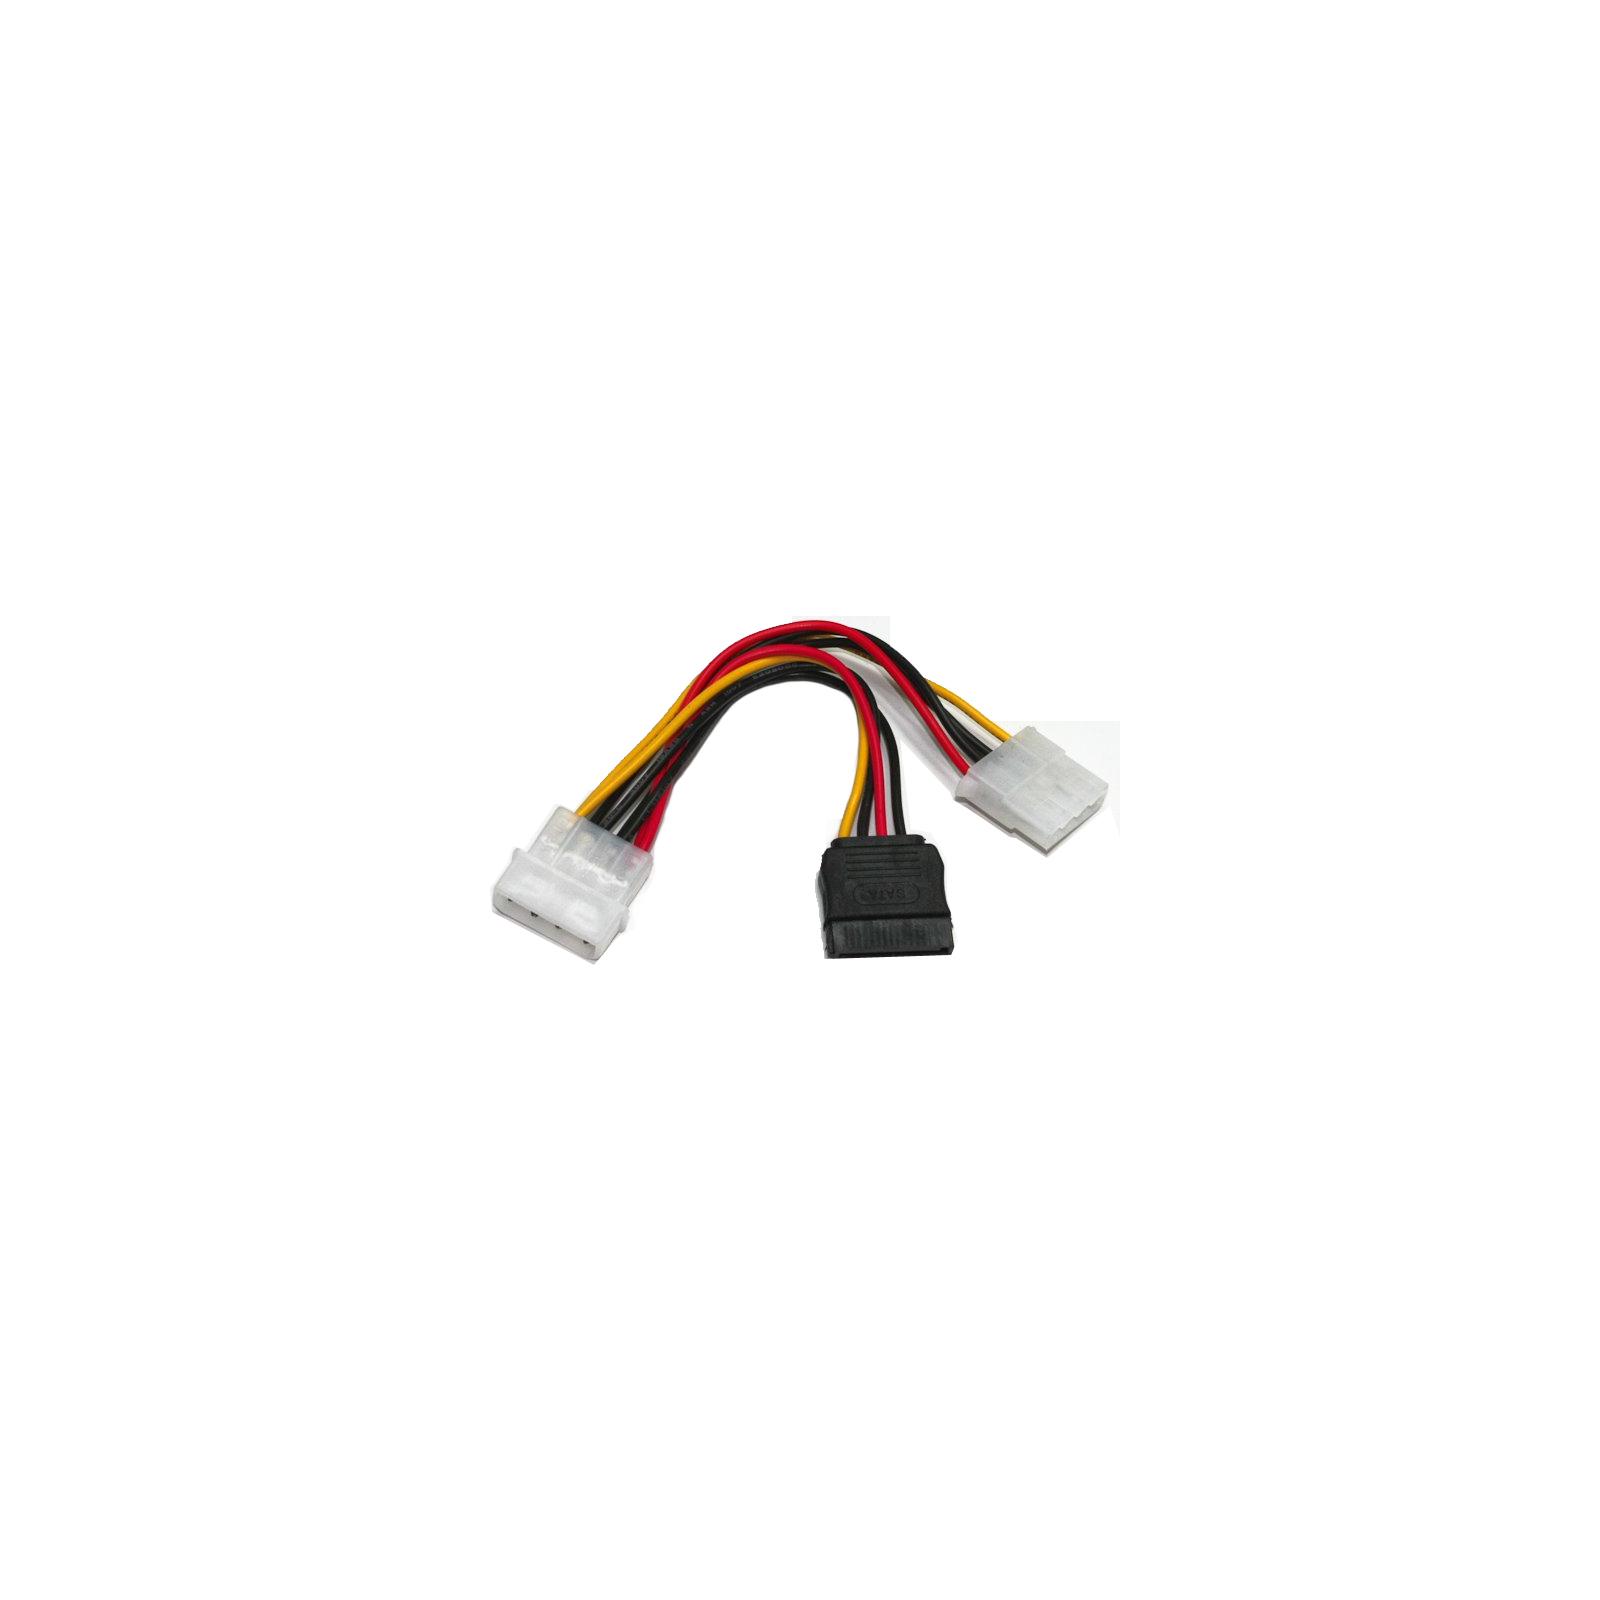 Кабель питания Cablexpert SATA-PSY2 (power) (CC-SATA-PSY2)